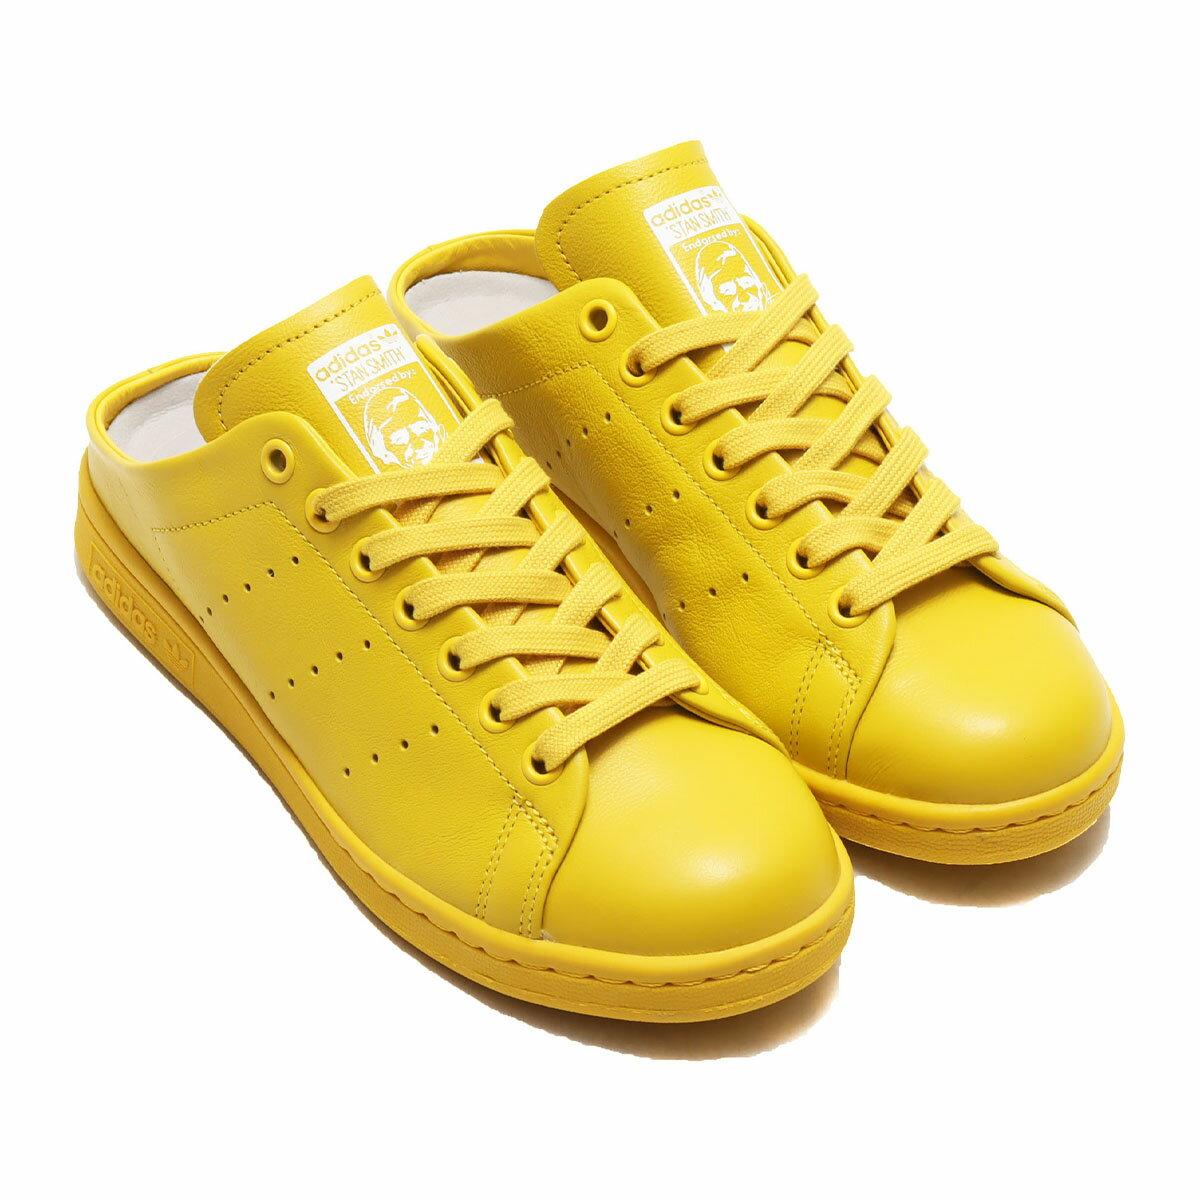 adidasSTANSMITHMULE(アディダススタンスミスミュール)TRIBEYELLOW/TRIBEYELLOW/FOOTWEARWHITE【レディースサンダル】20SS-S